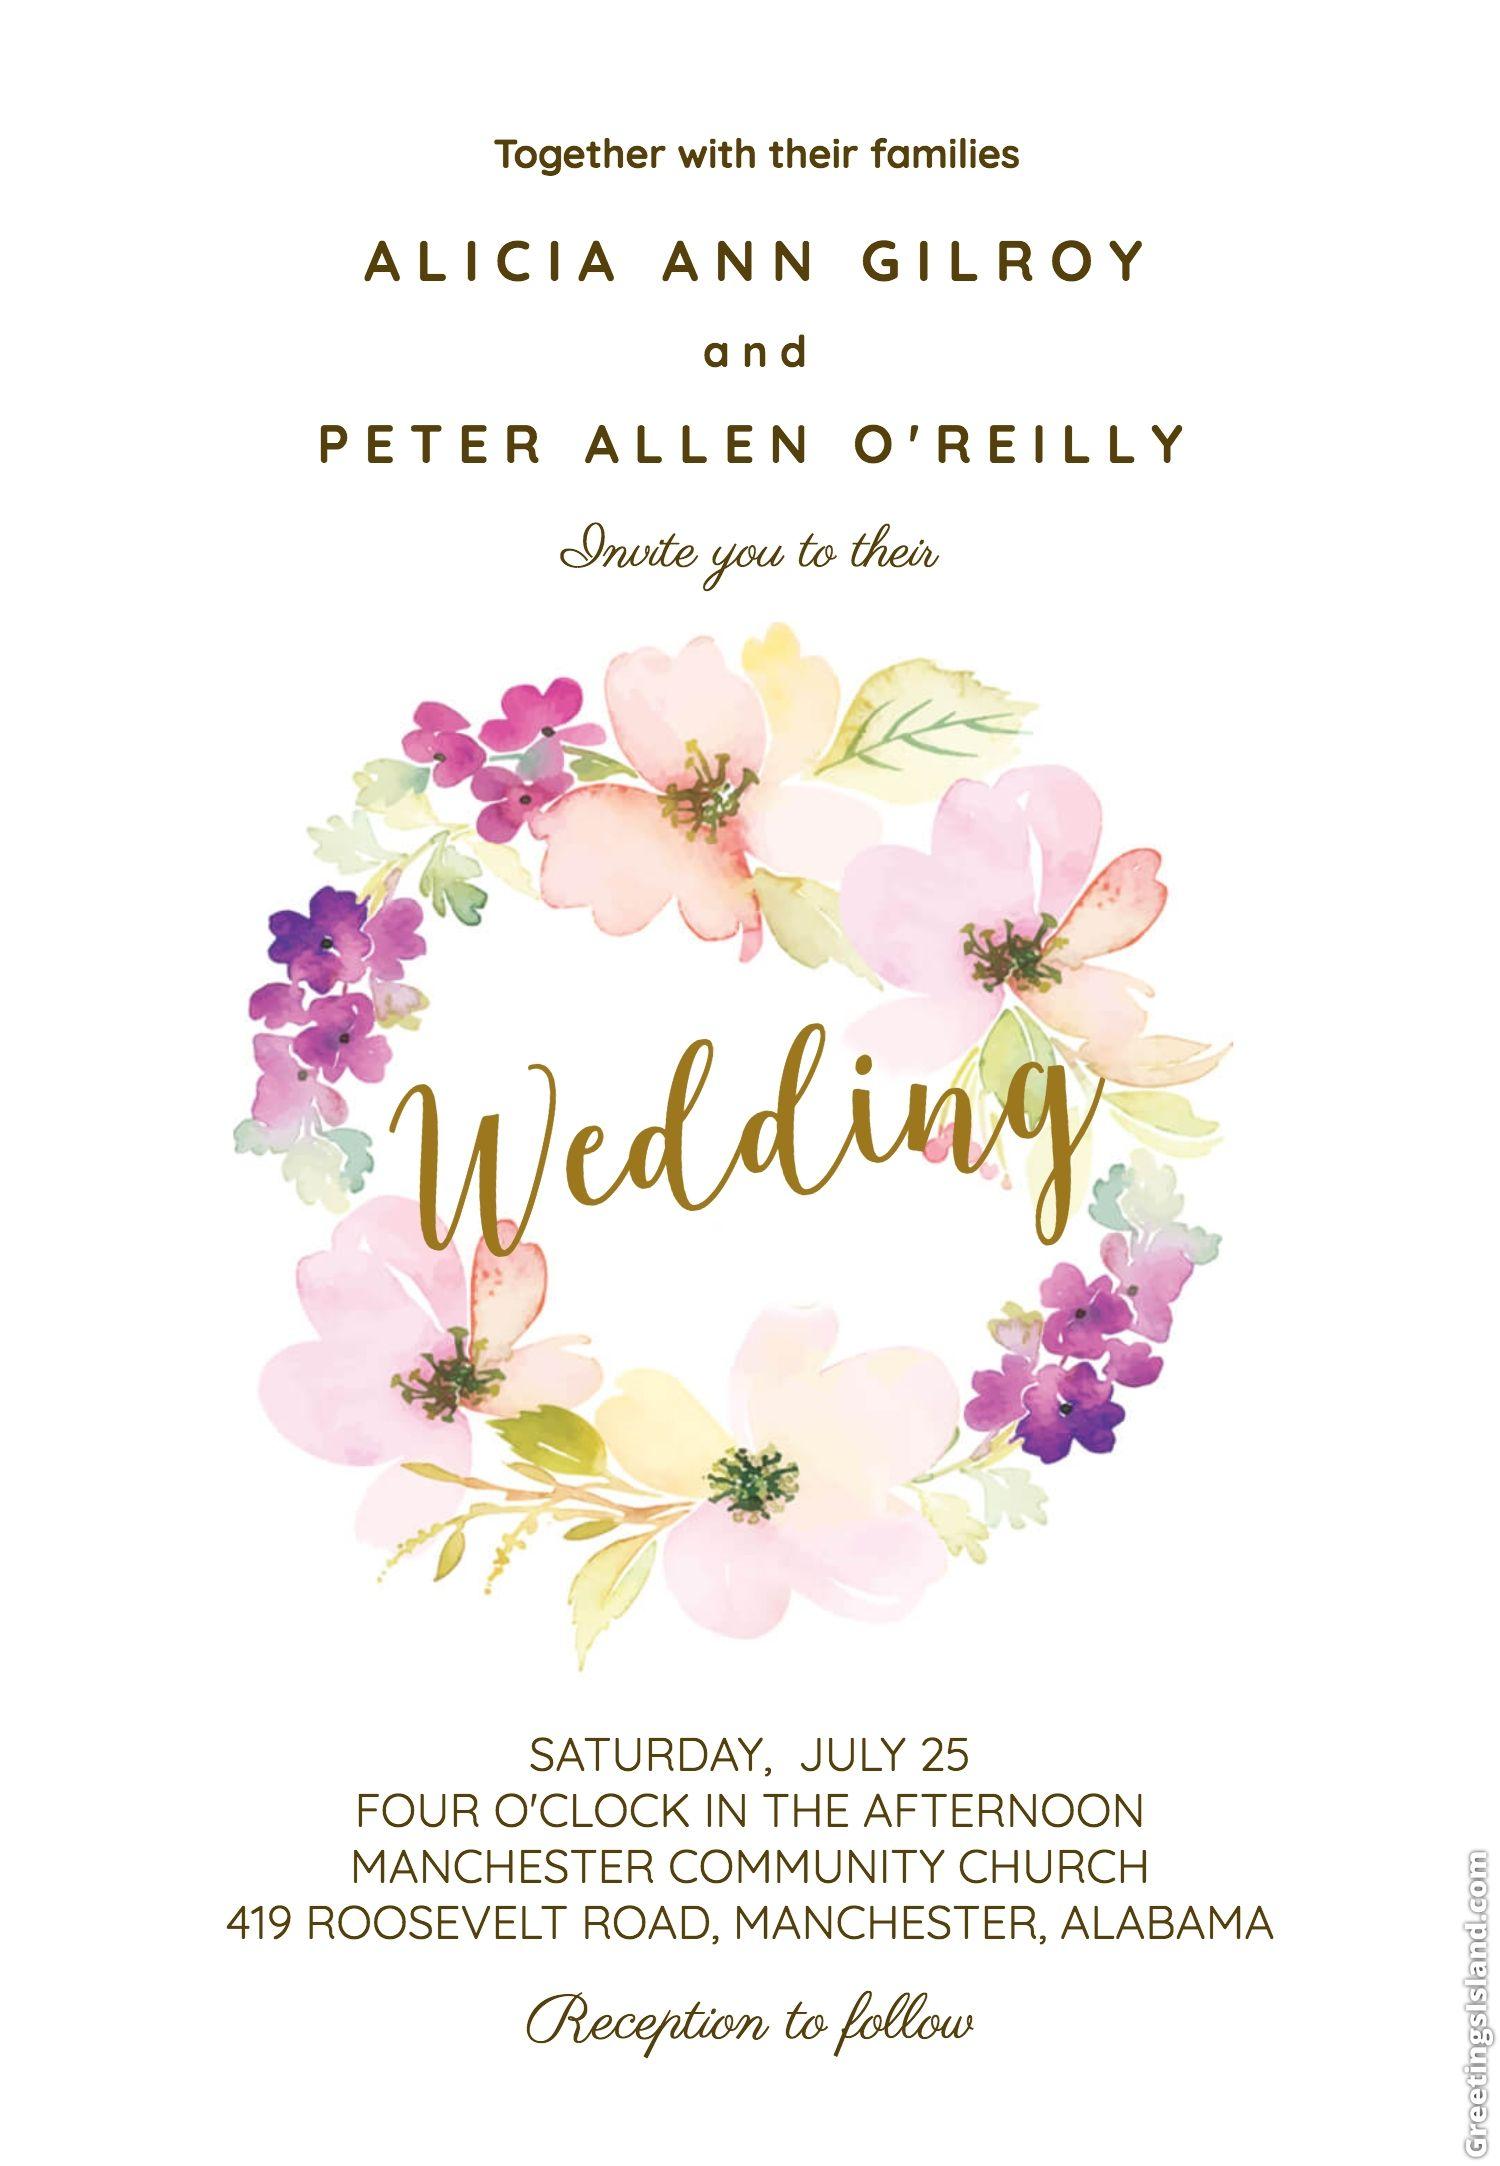 Wonderful 25 Most Popular Wedding Invitations 2019 Free Wedding Invitation Templates Rustic Popular Wedding Invitations Wedding Invitation Templates